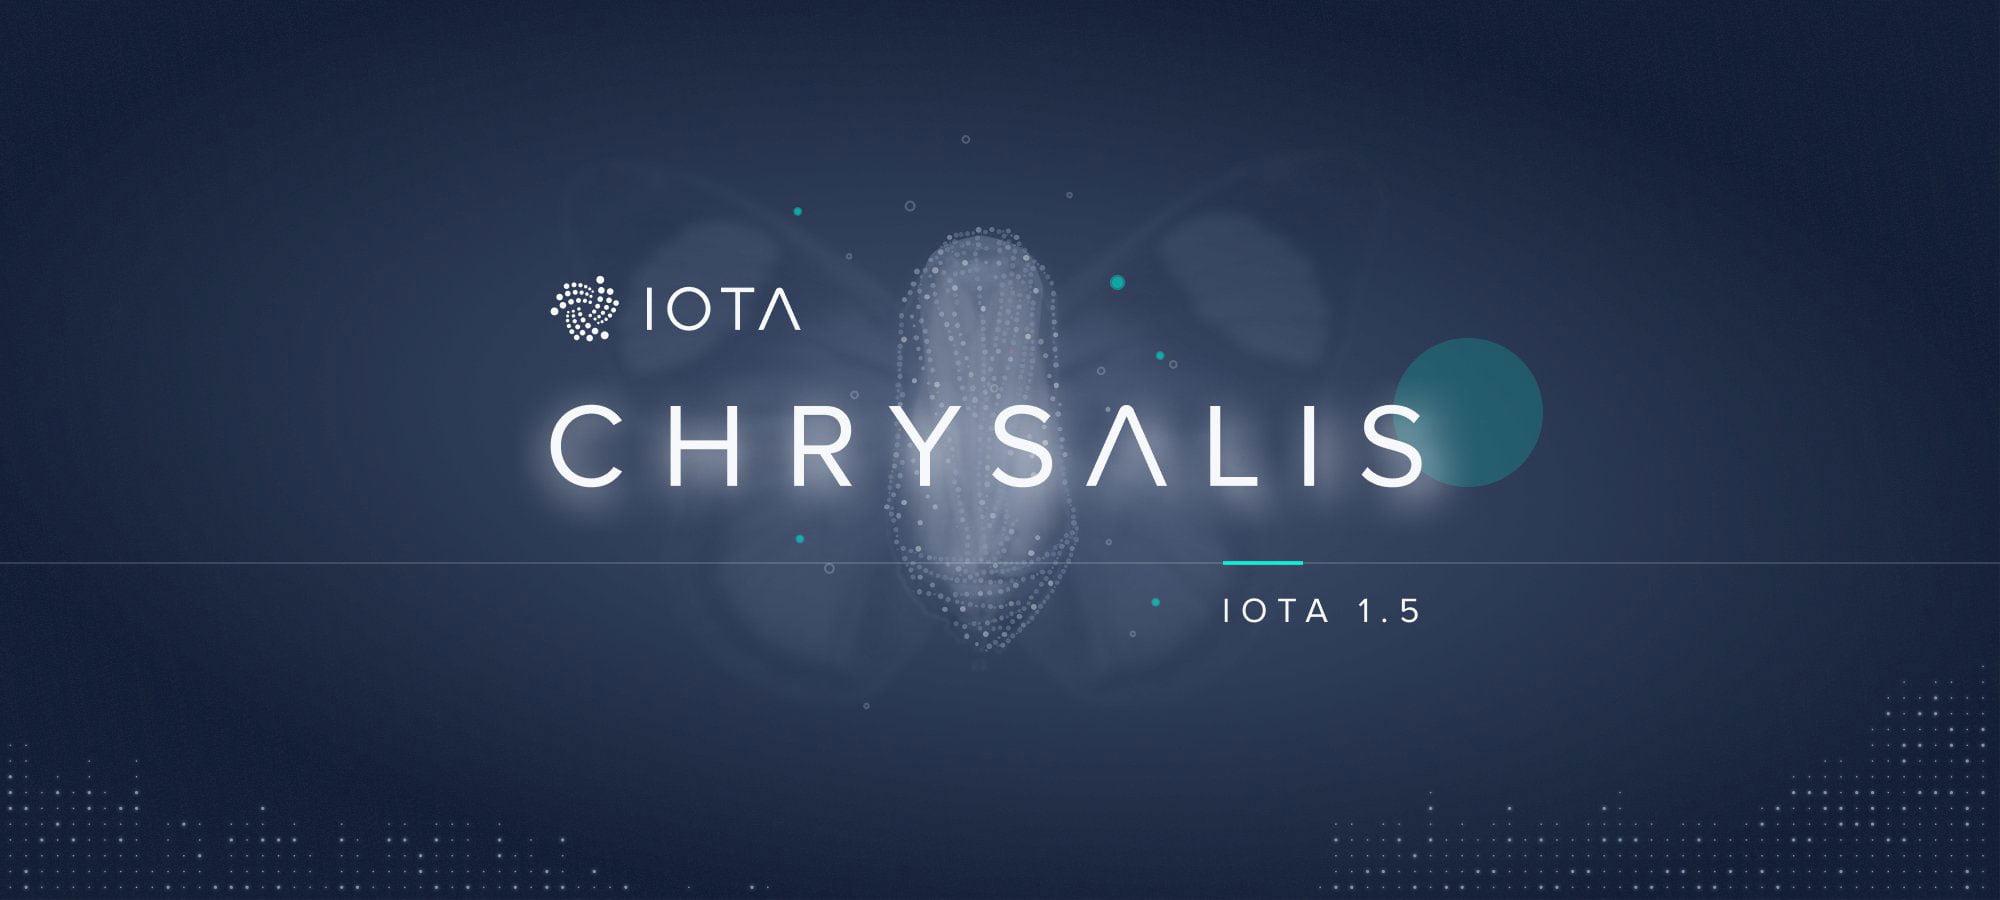 Chrysalis IOTA